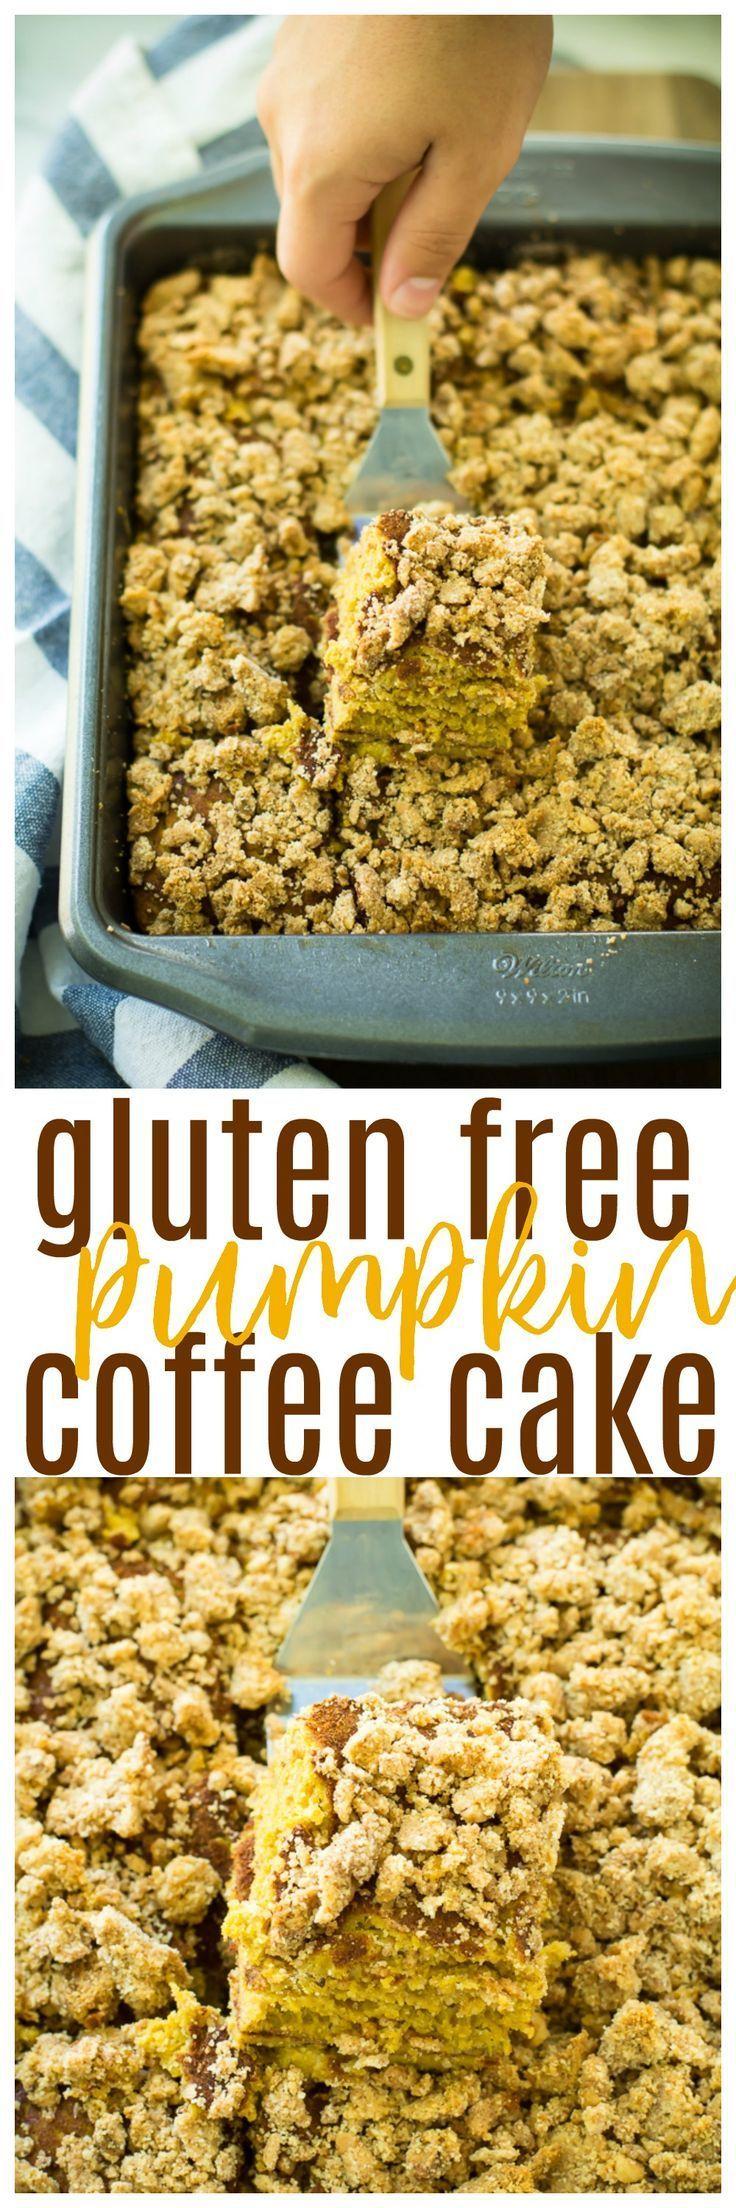 Gluten Free Pumpkin Coffee Cake Recipe Pumpkin coffee